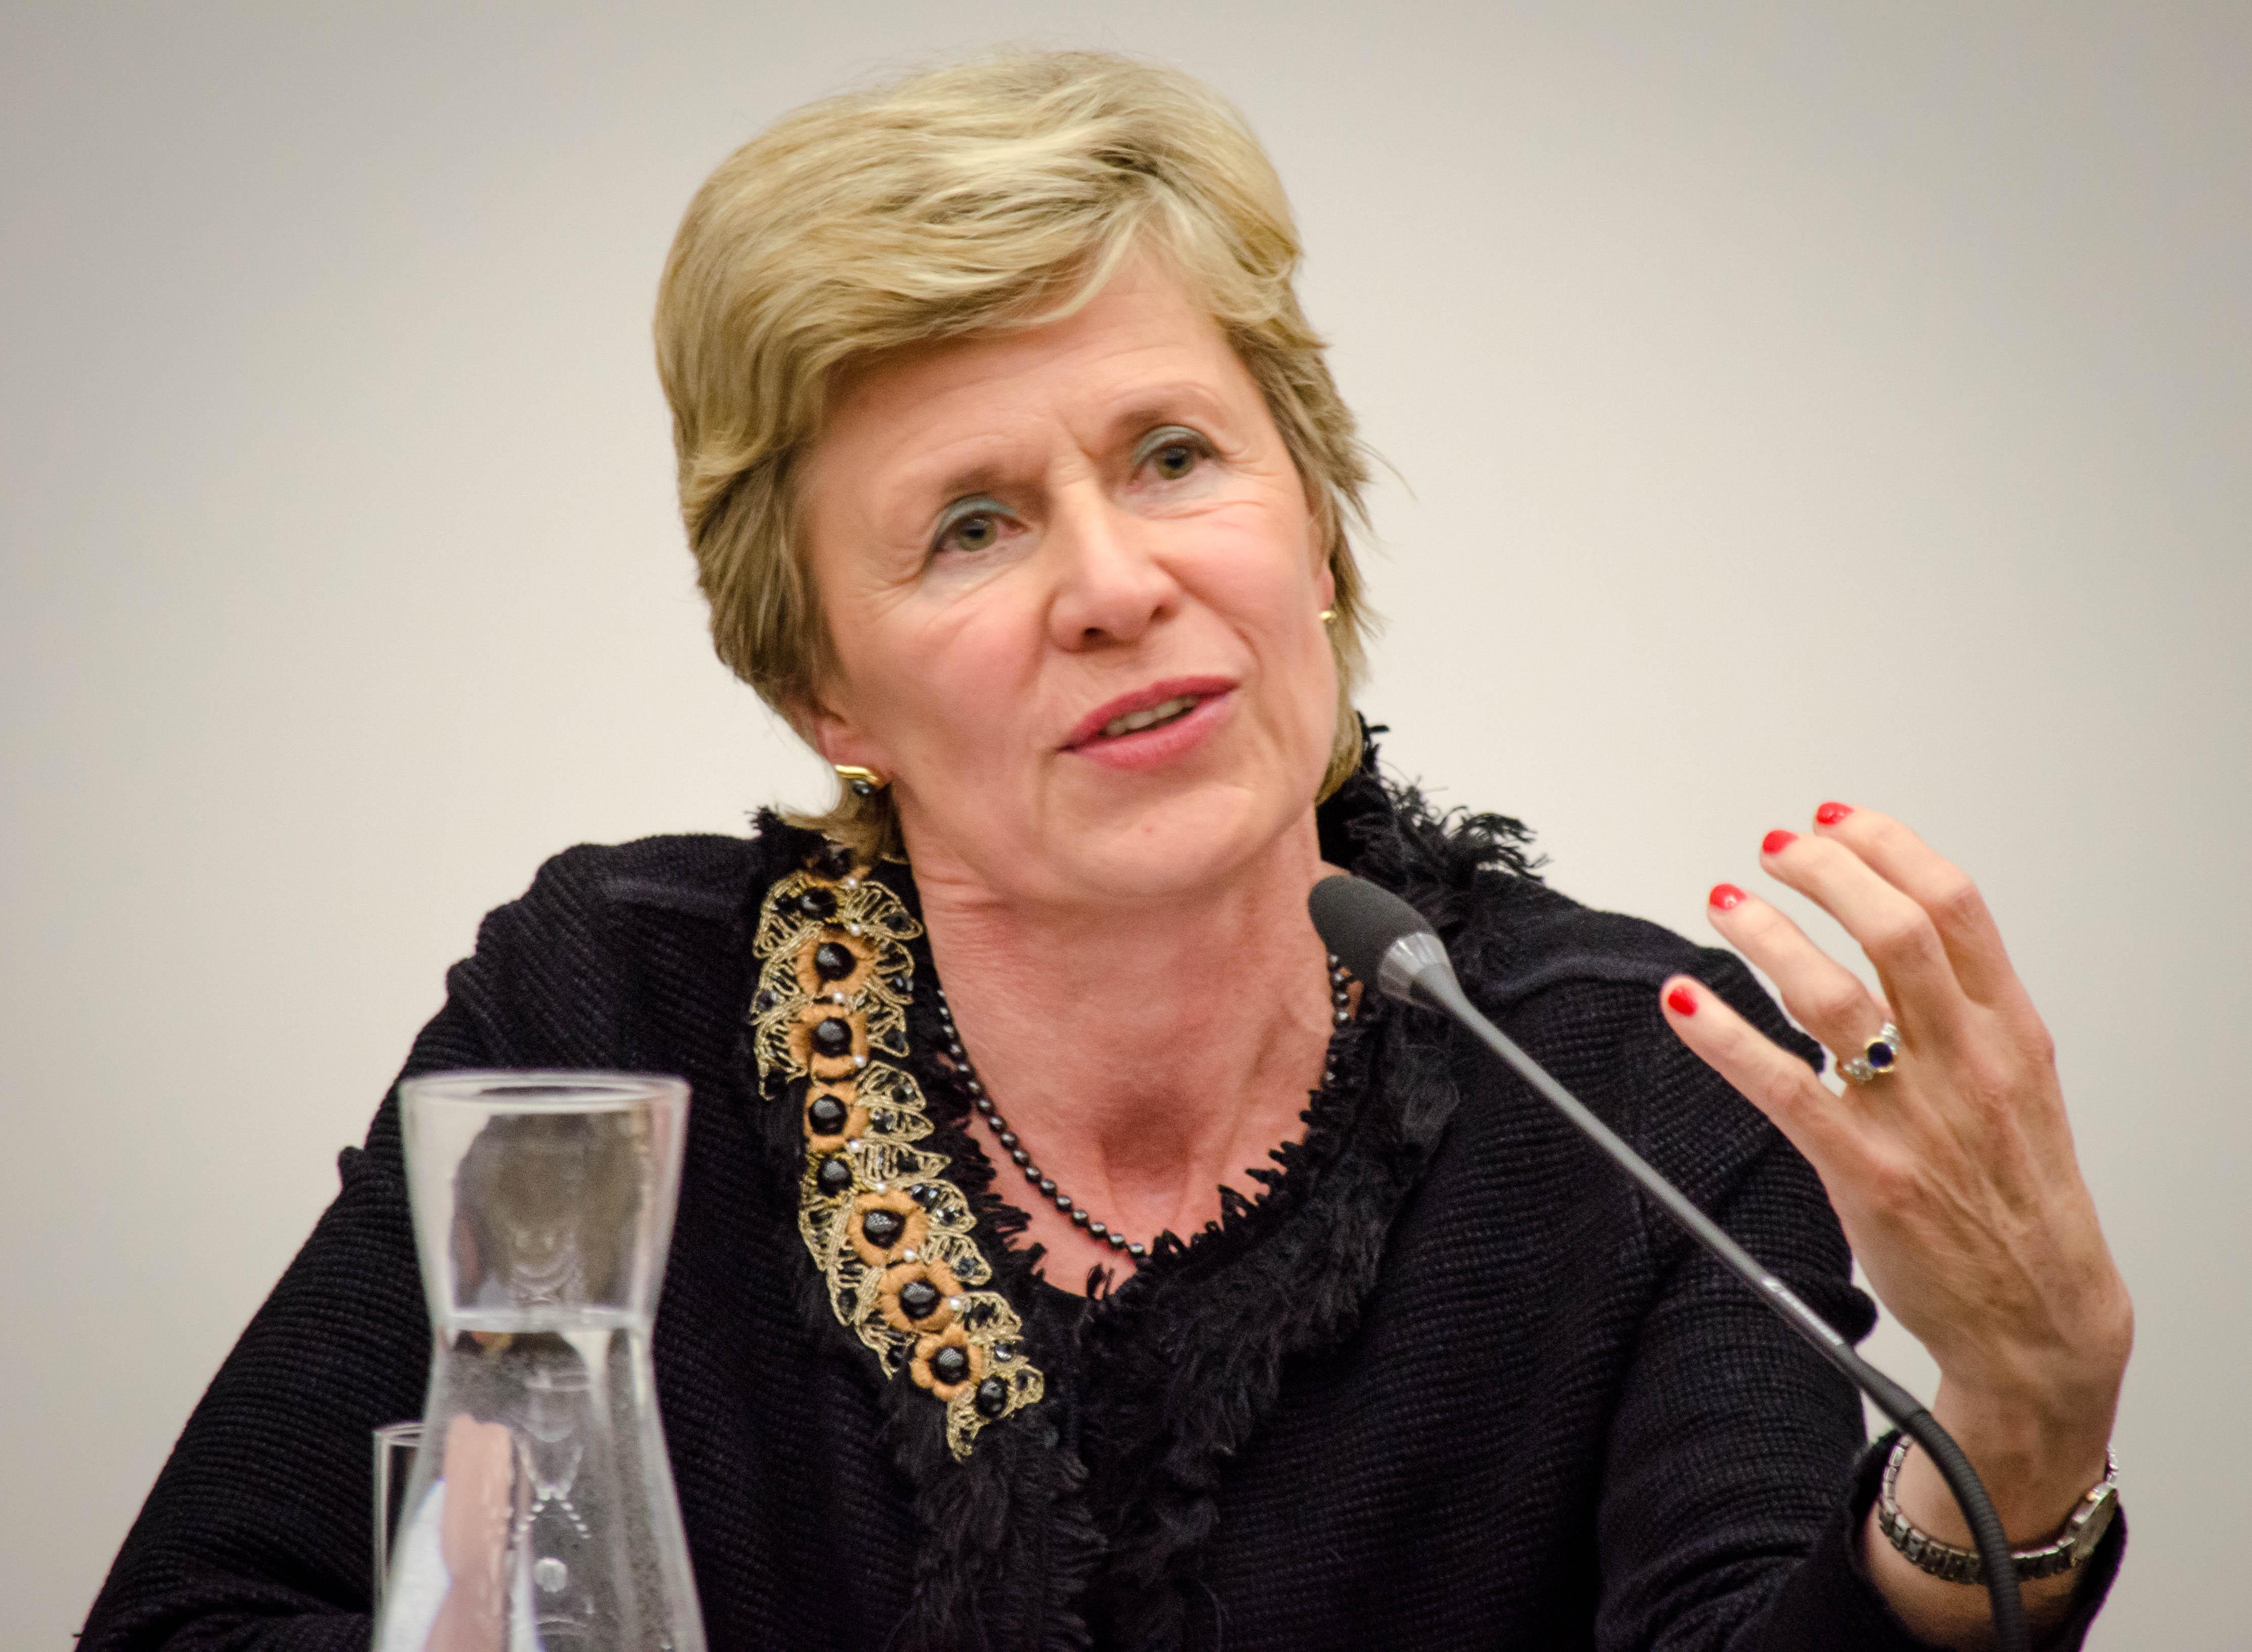 image of Anne De Paepe